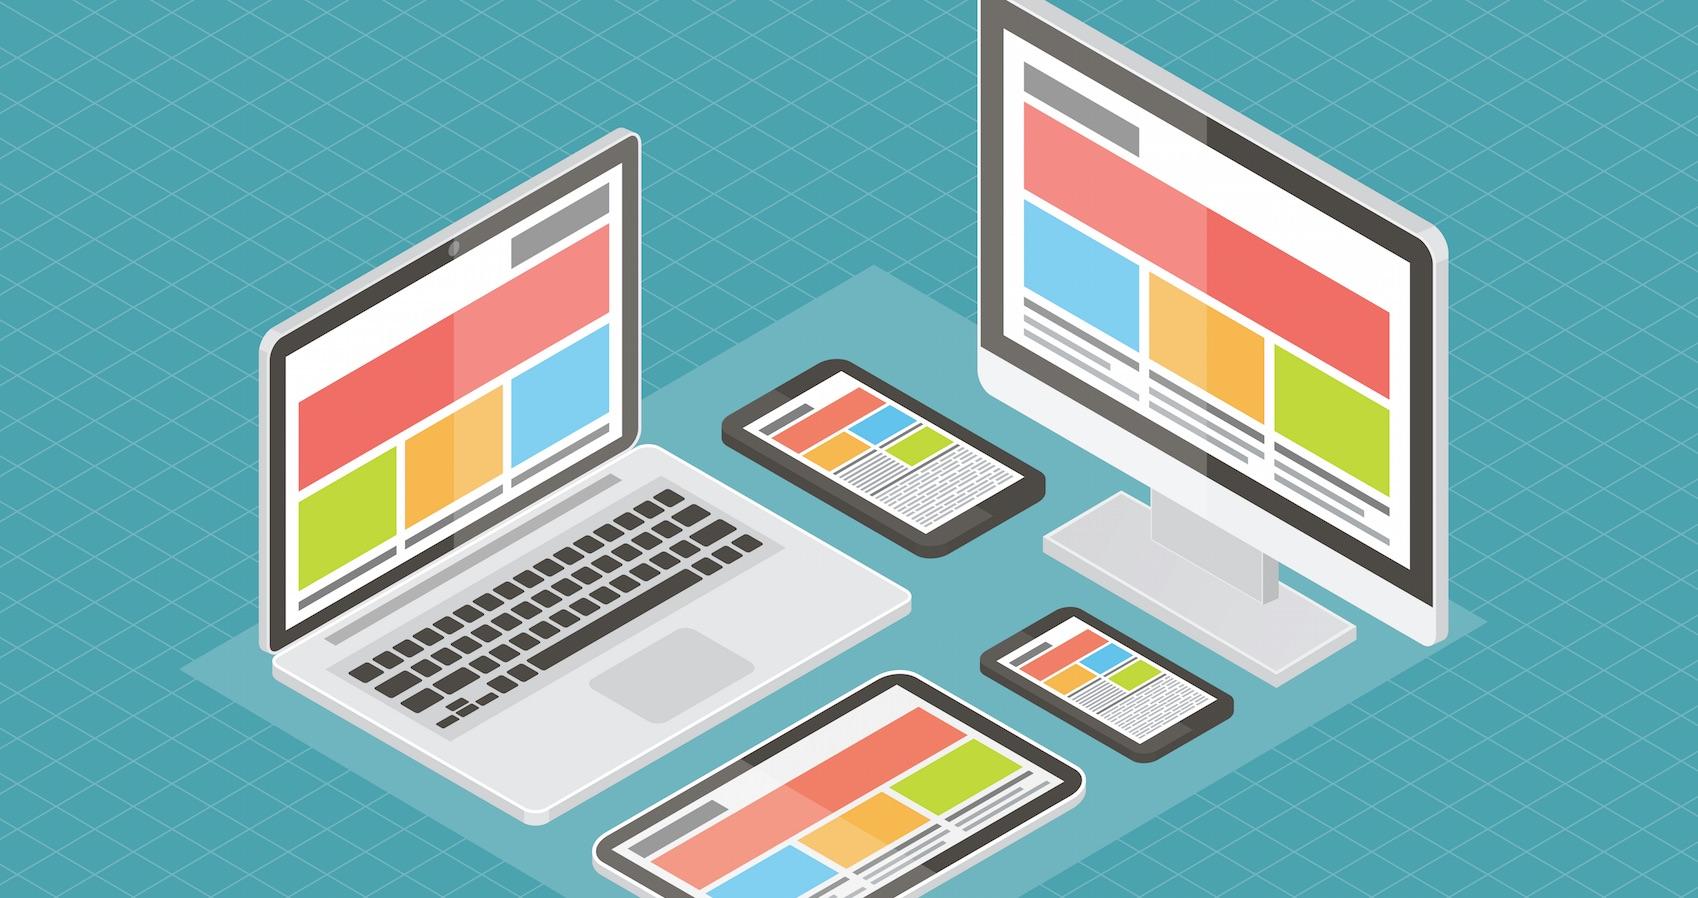 Web-Design-Image-1.jpg